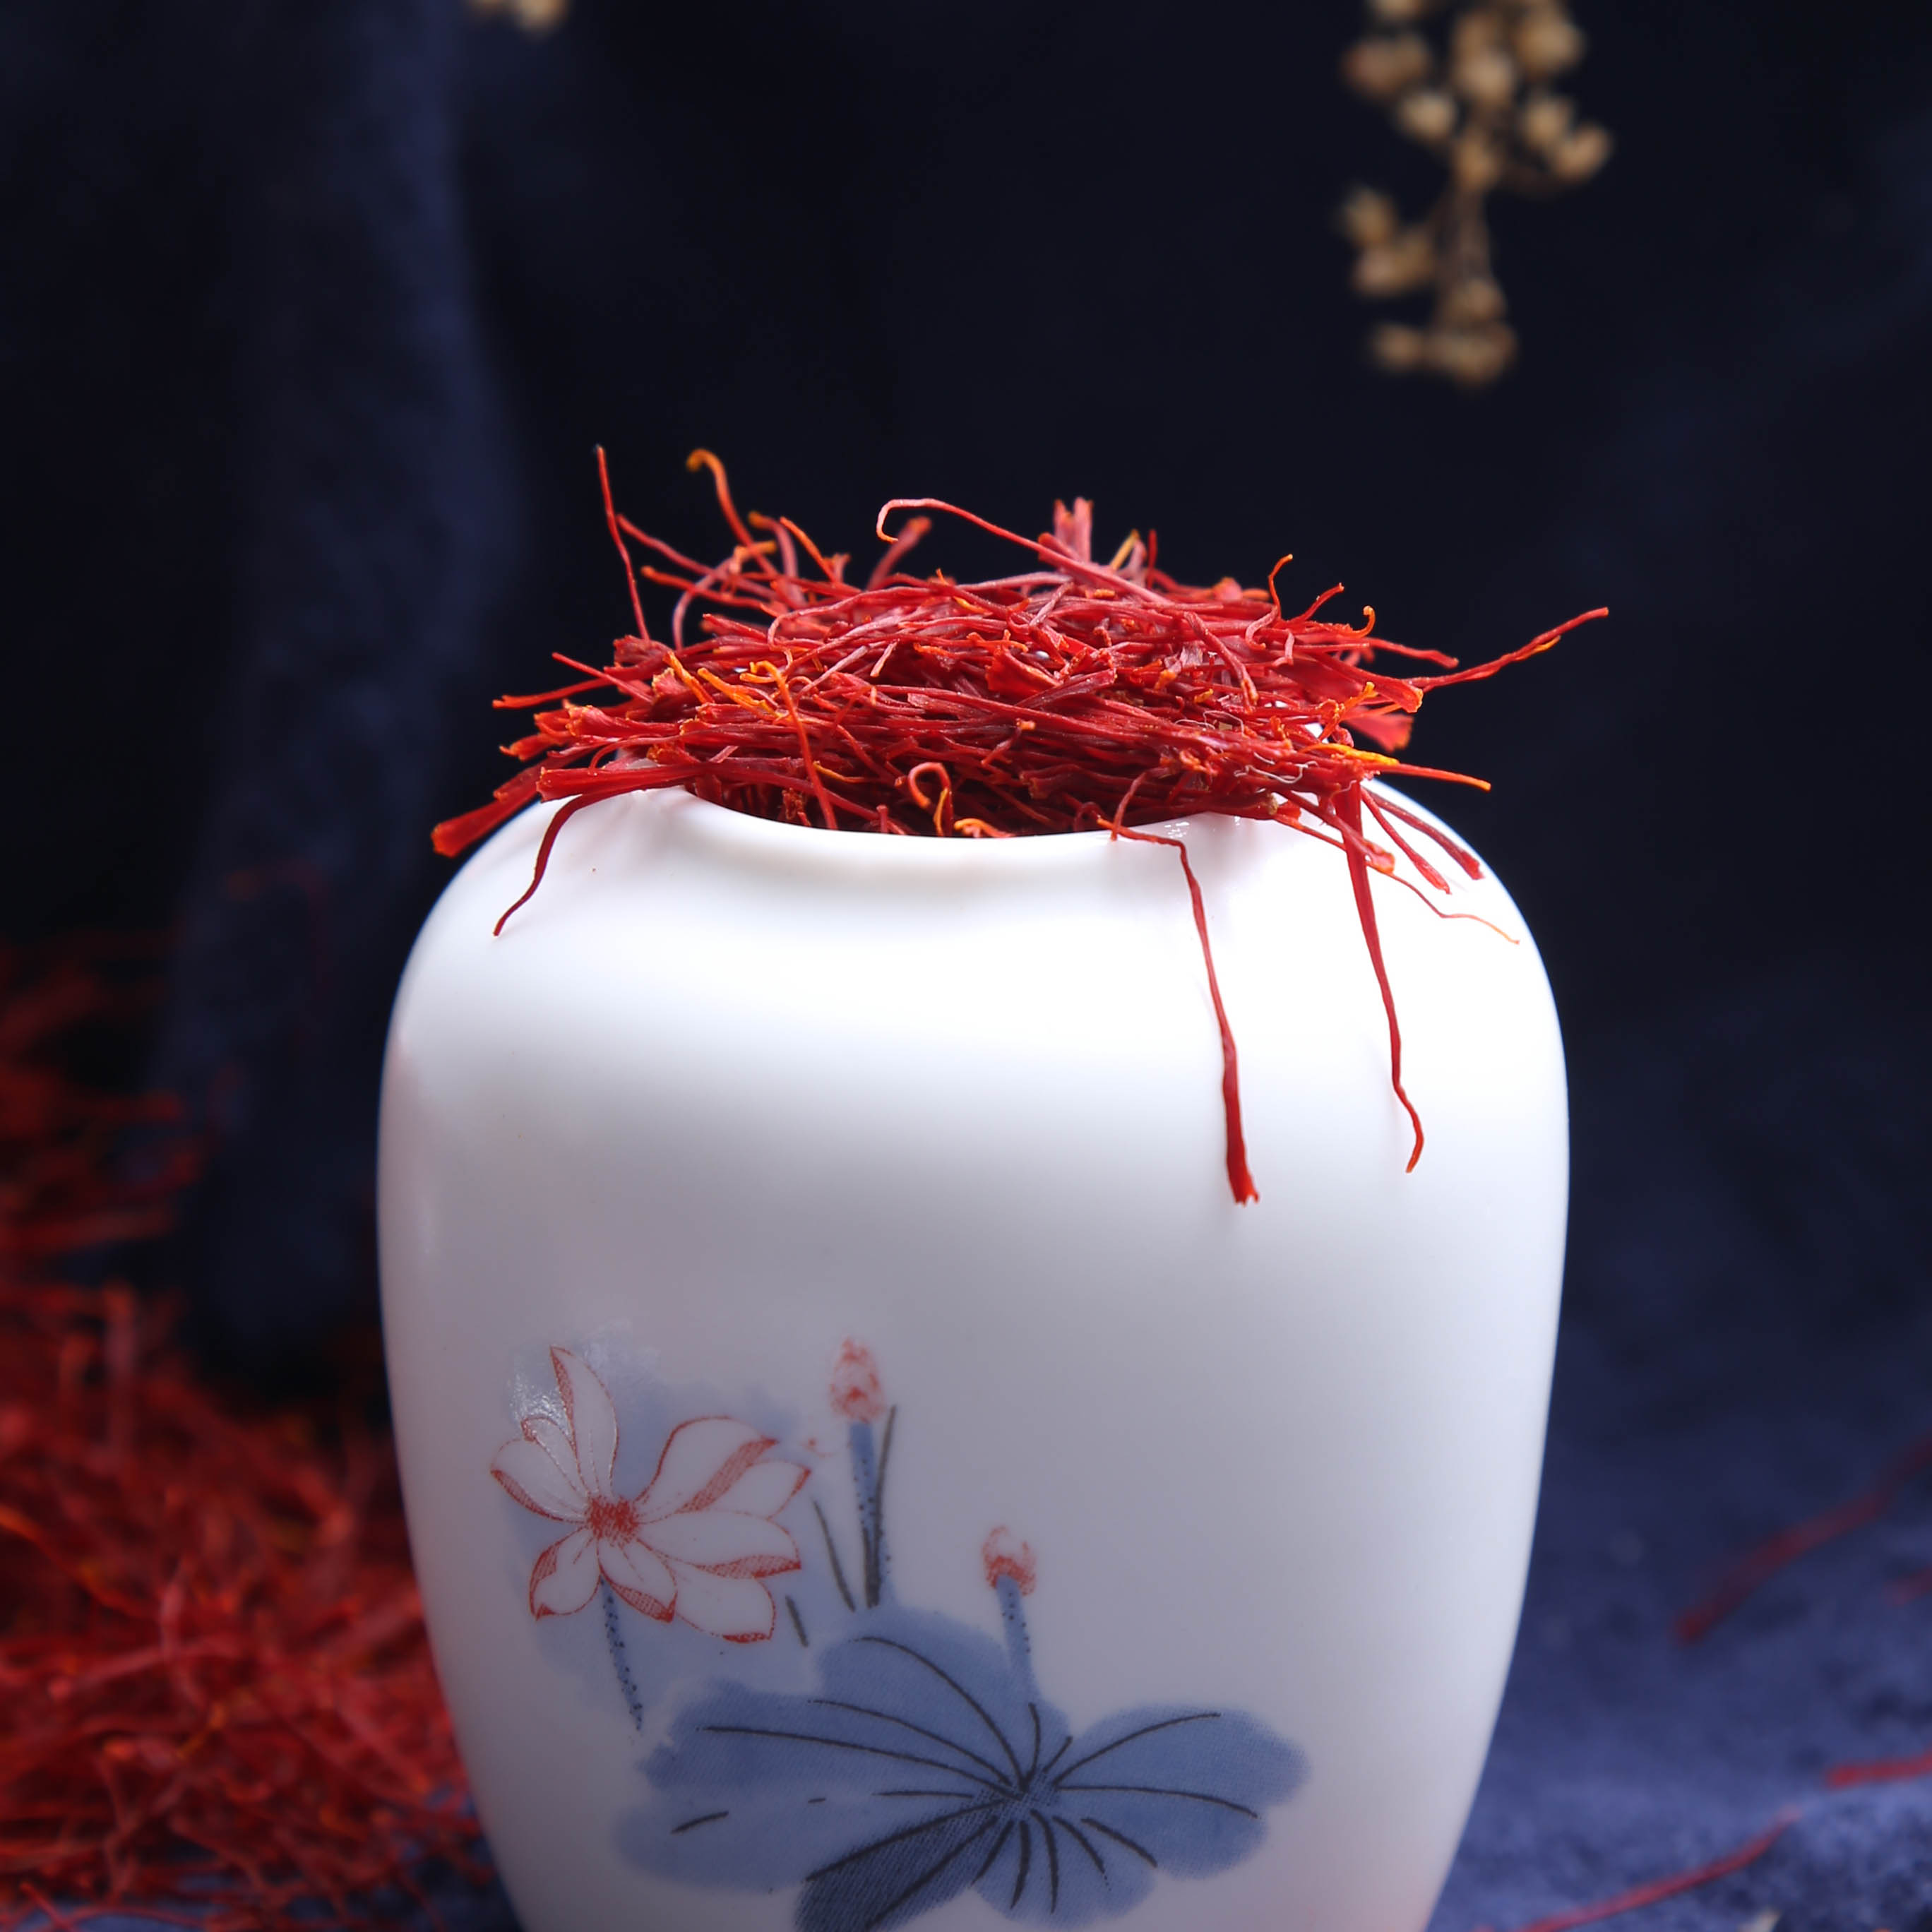 [【买一] в подарок [一】共6克藏] красный [花 ] оригинал [ 特级 西藏 非10g 臧] красный [花伊朗]